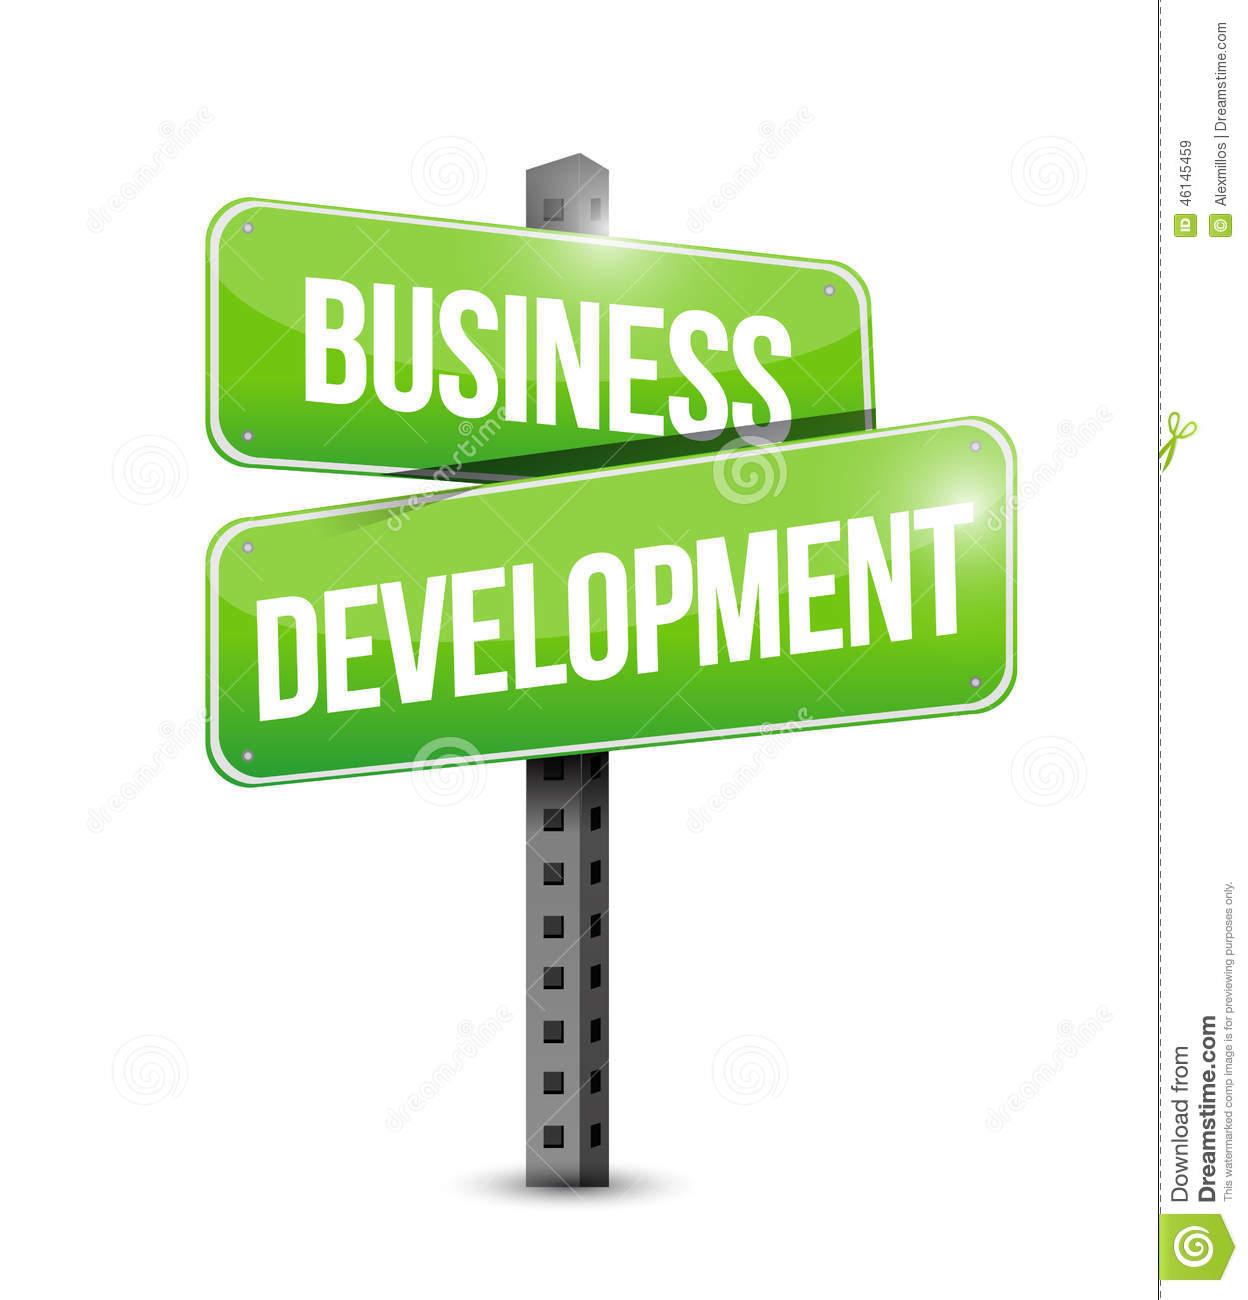 Business Development Road Sign Stock Illustration.